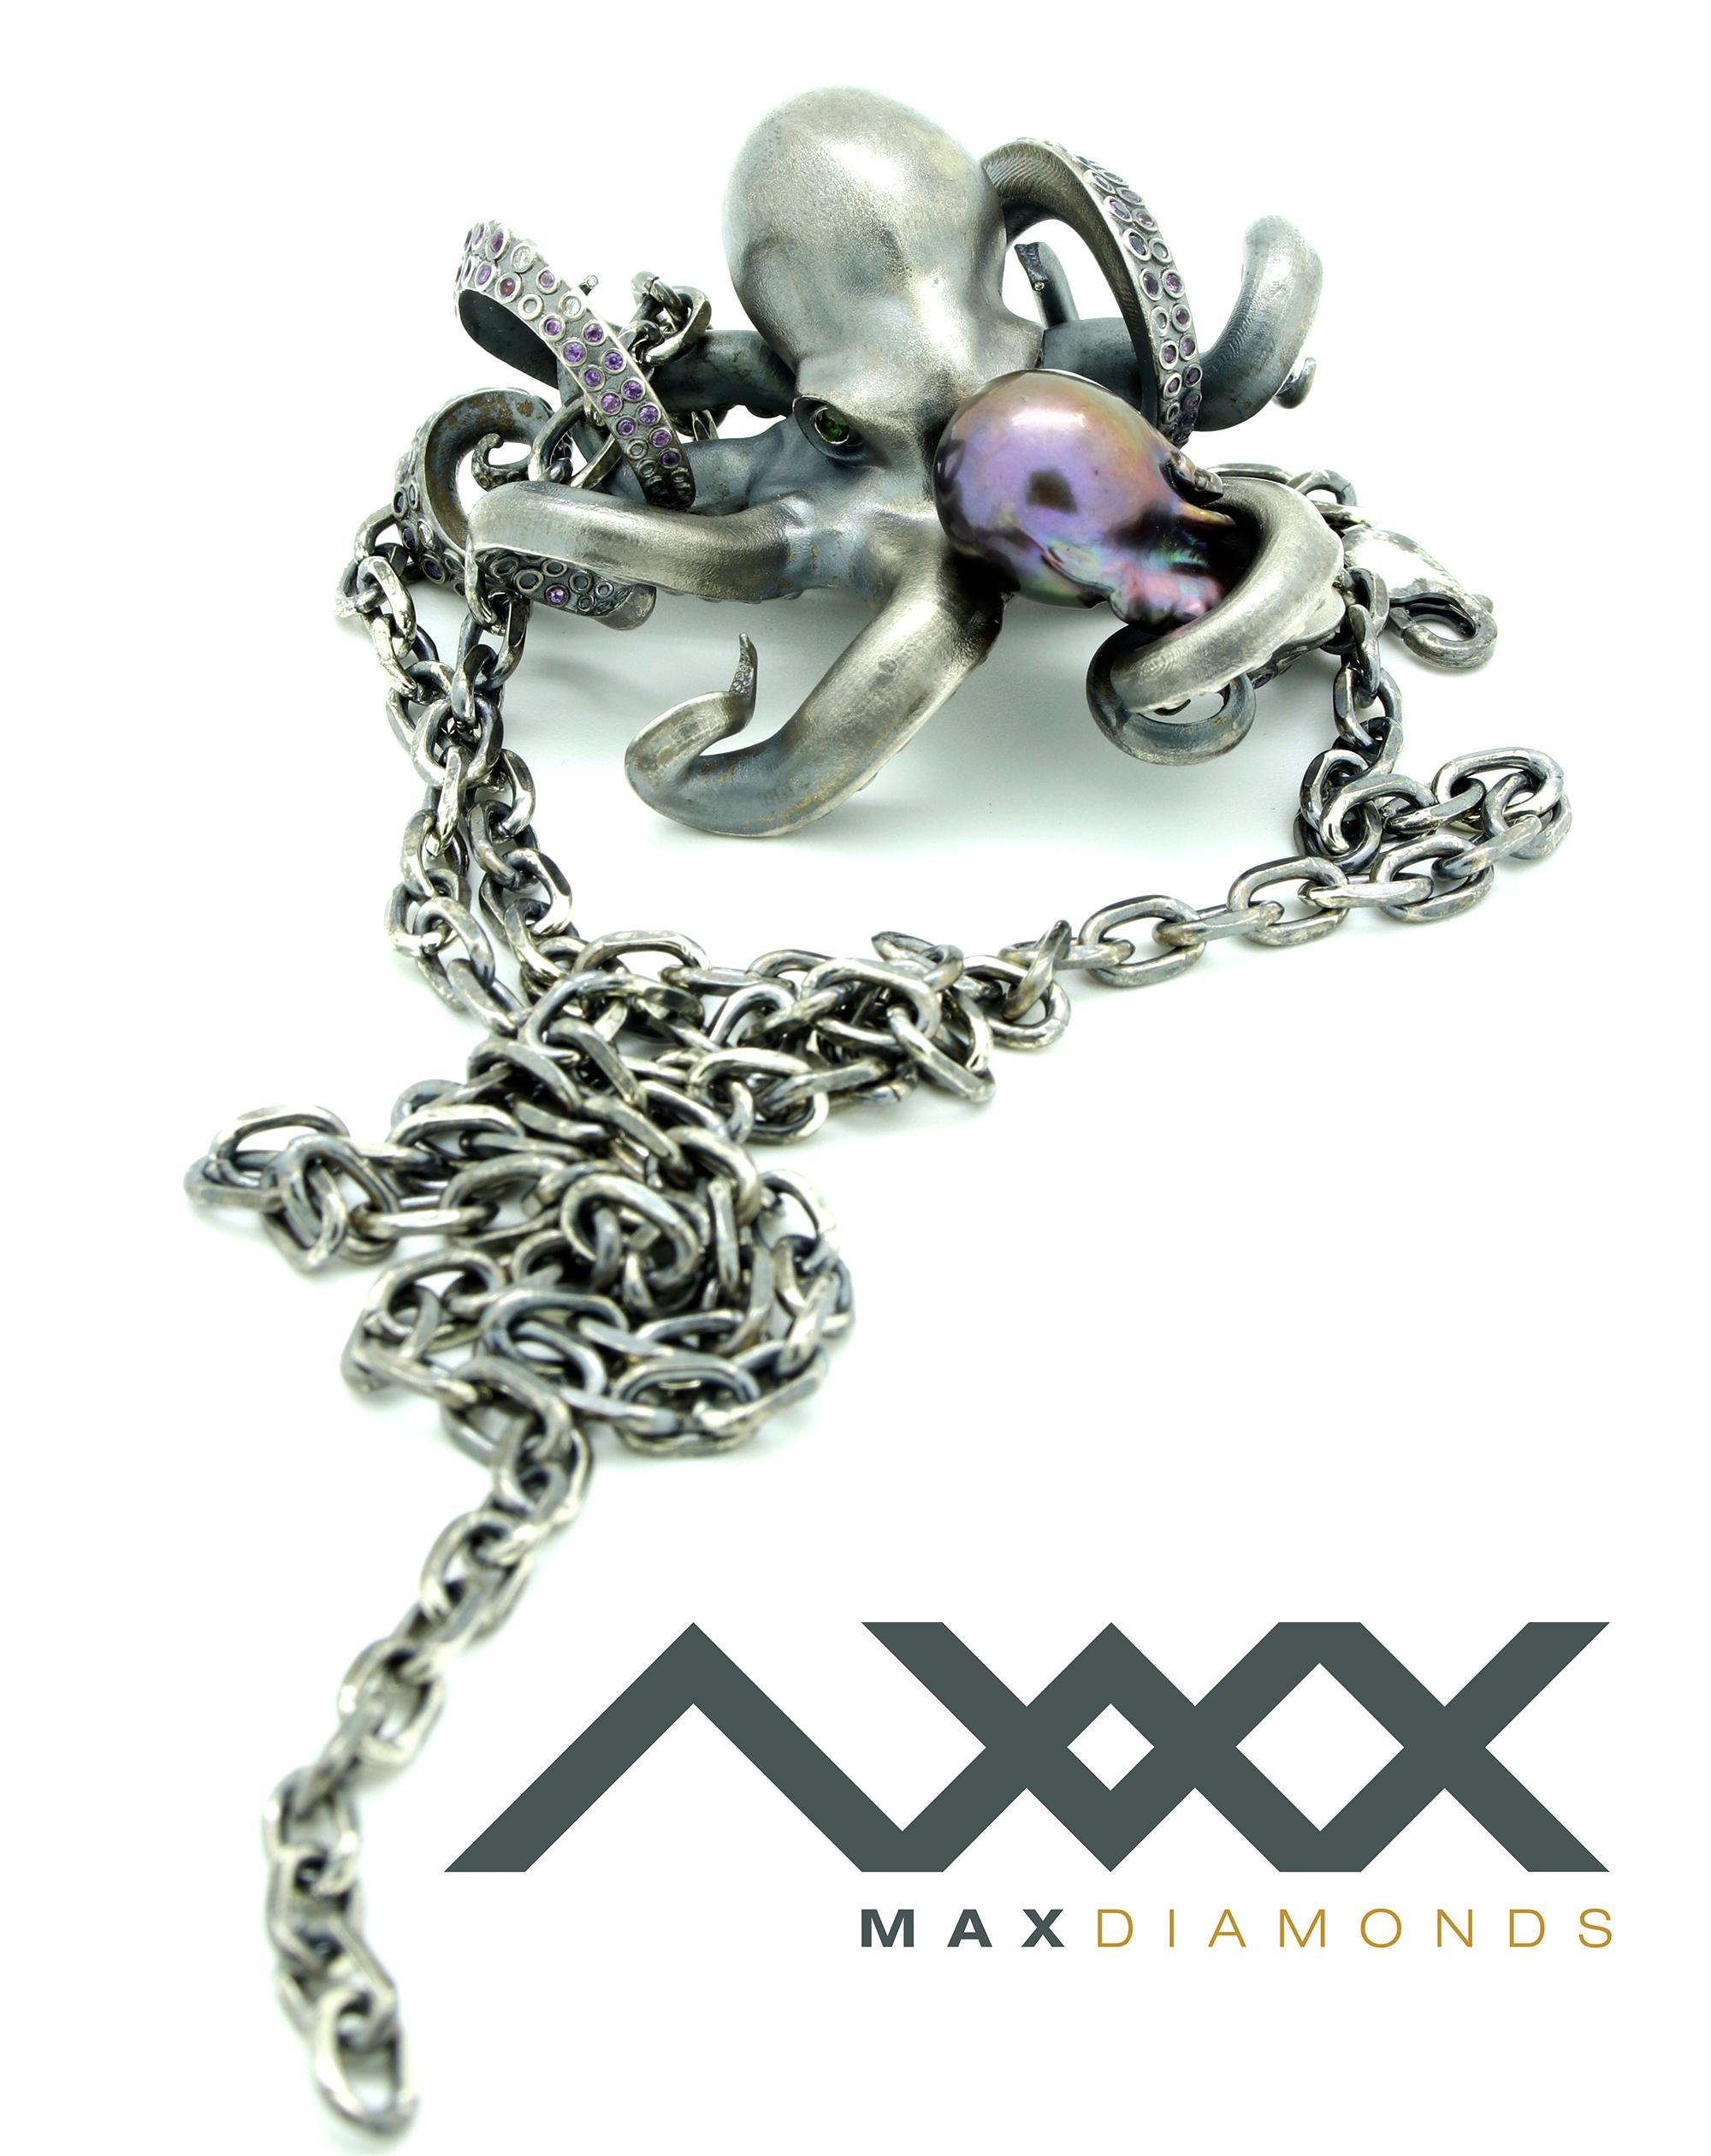 Blackened Silver octopus pendant 3Design